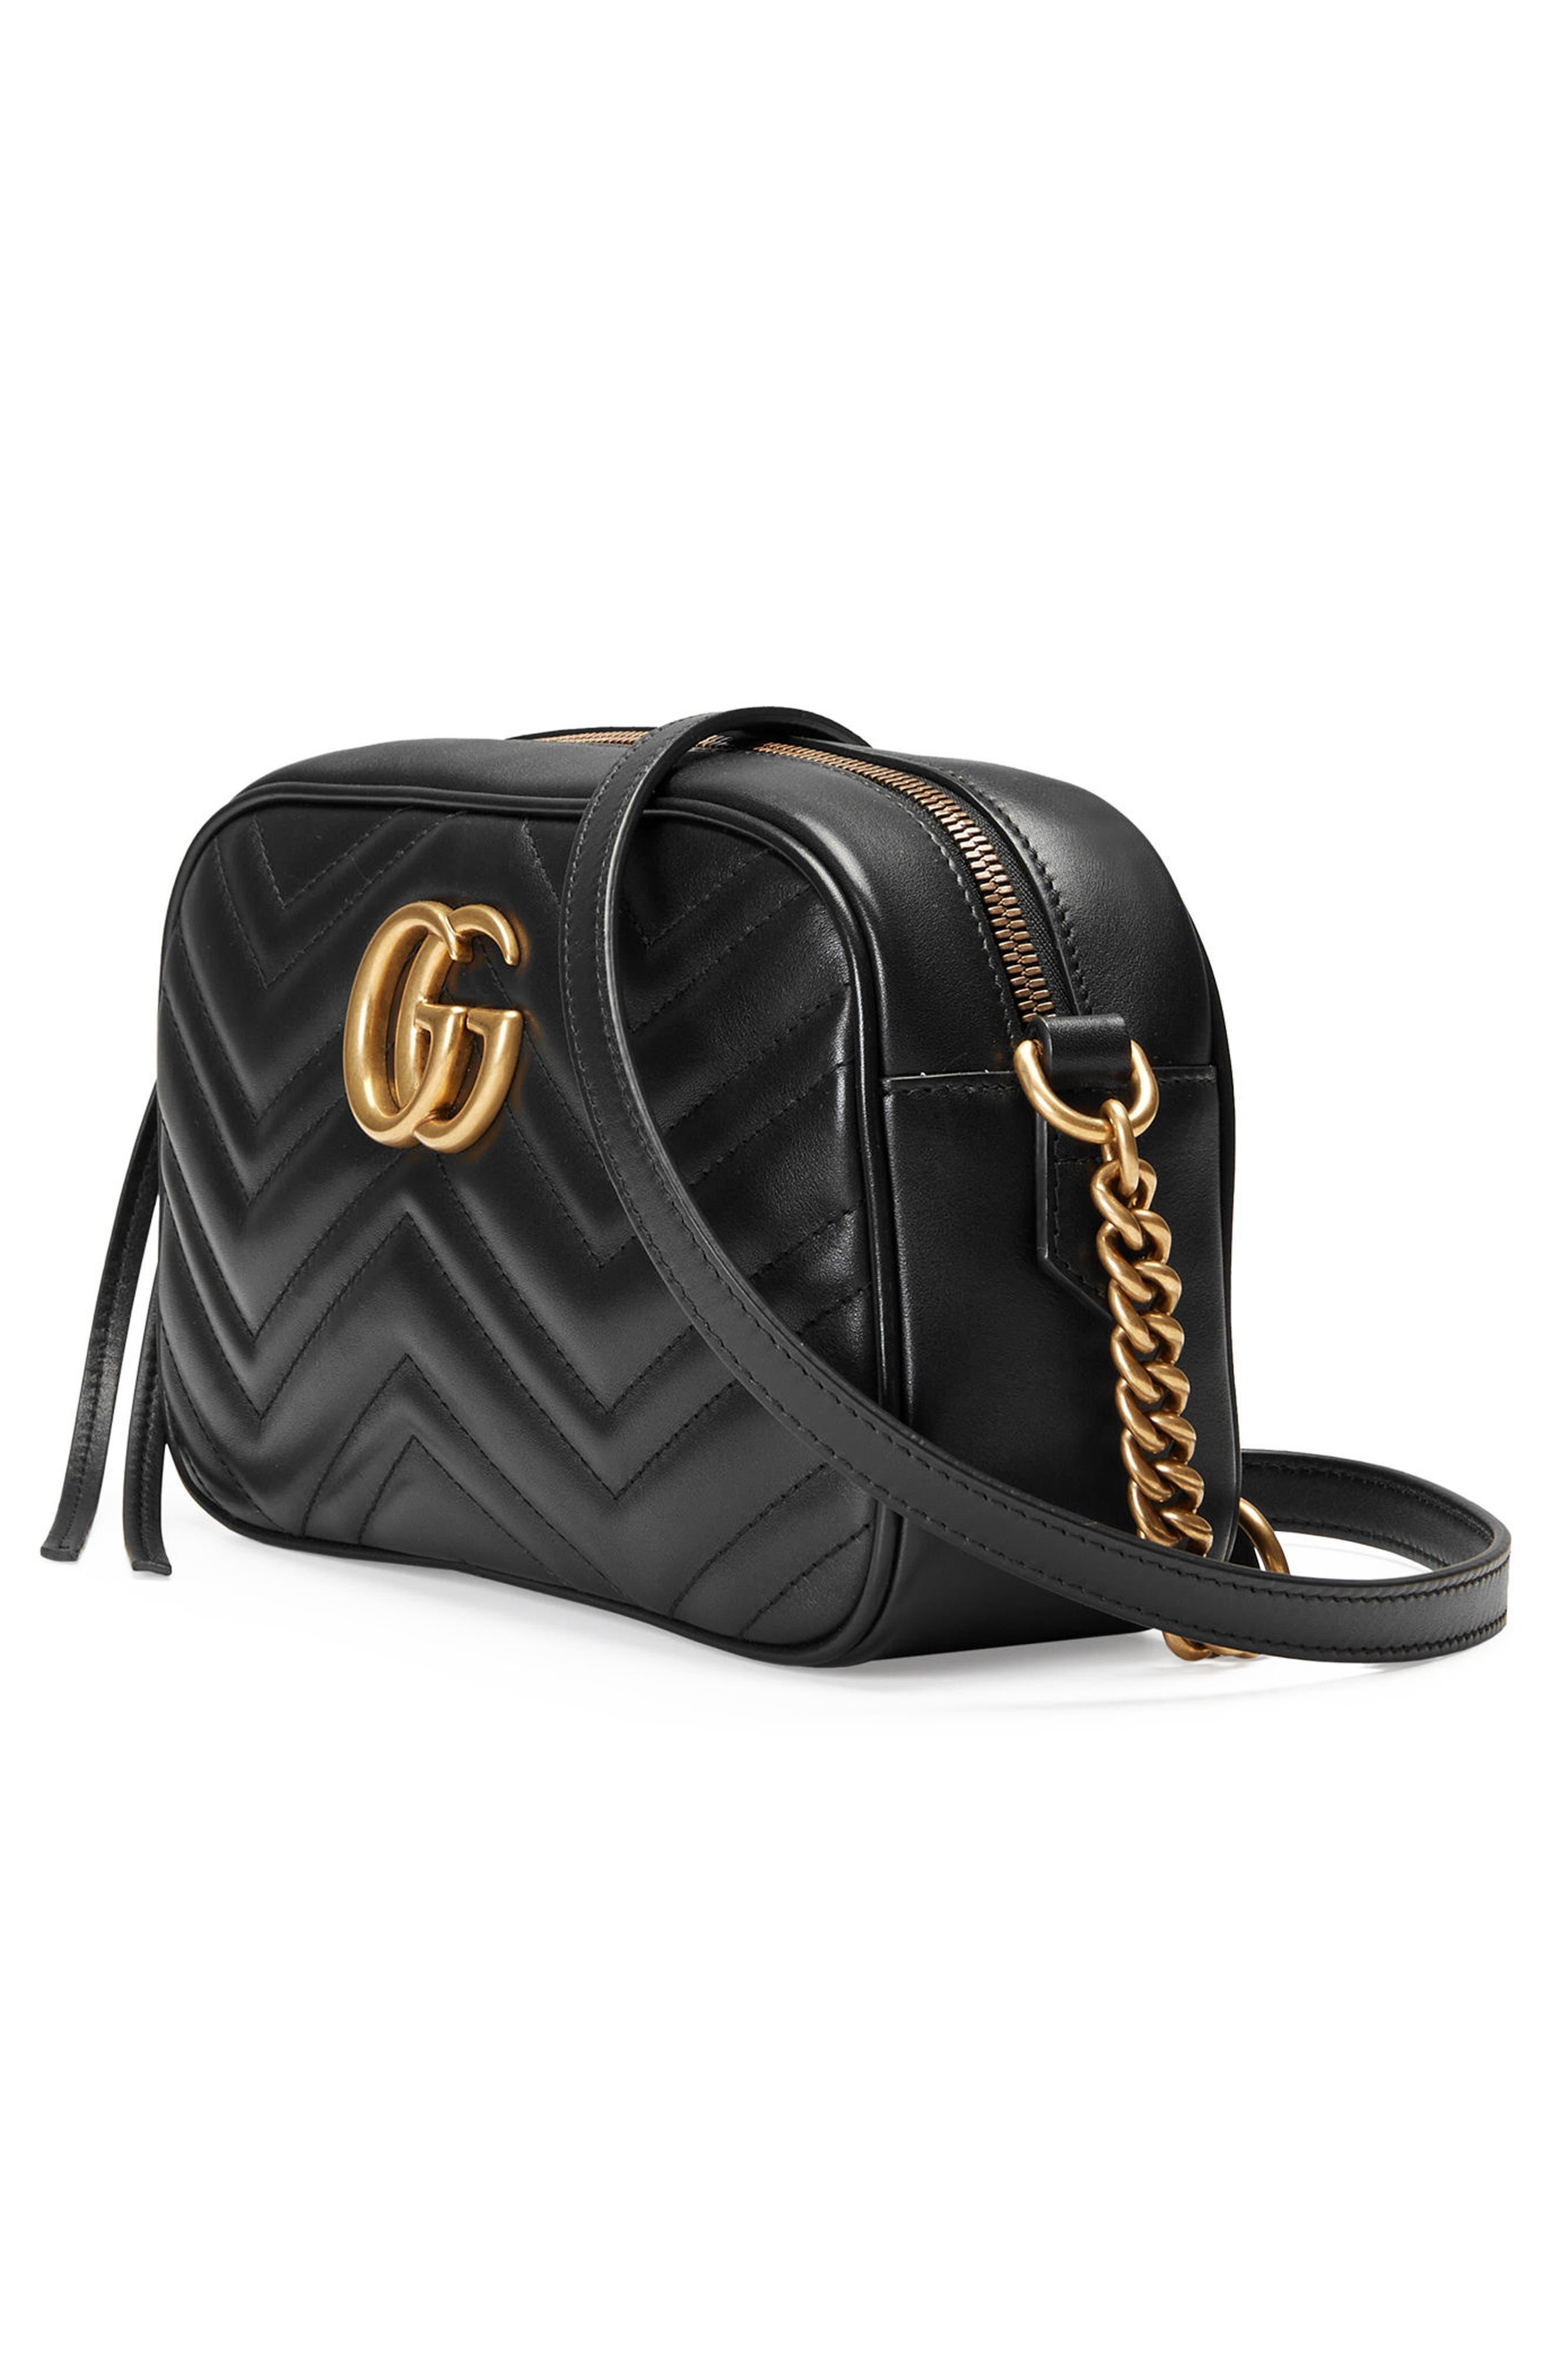 GUCCI,                             GG Marmont 2.0 Matelassé Leather Camera Bag,                             Alternate thumbnail 4, color,                             001